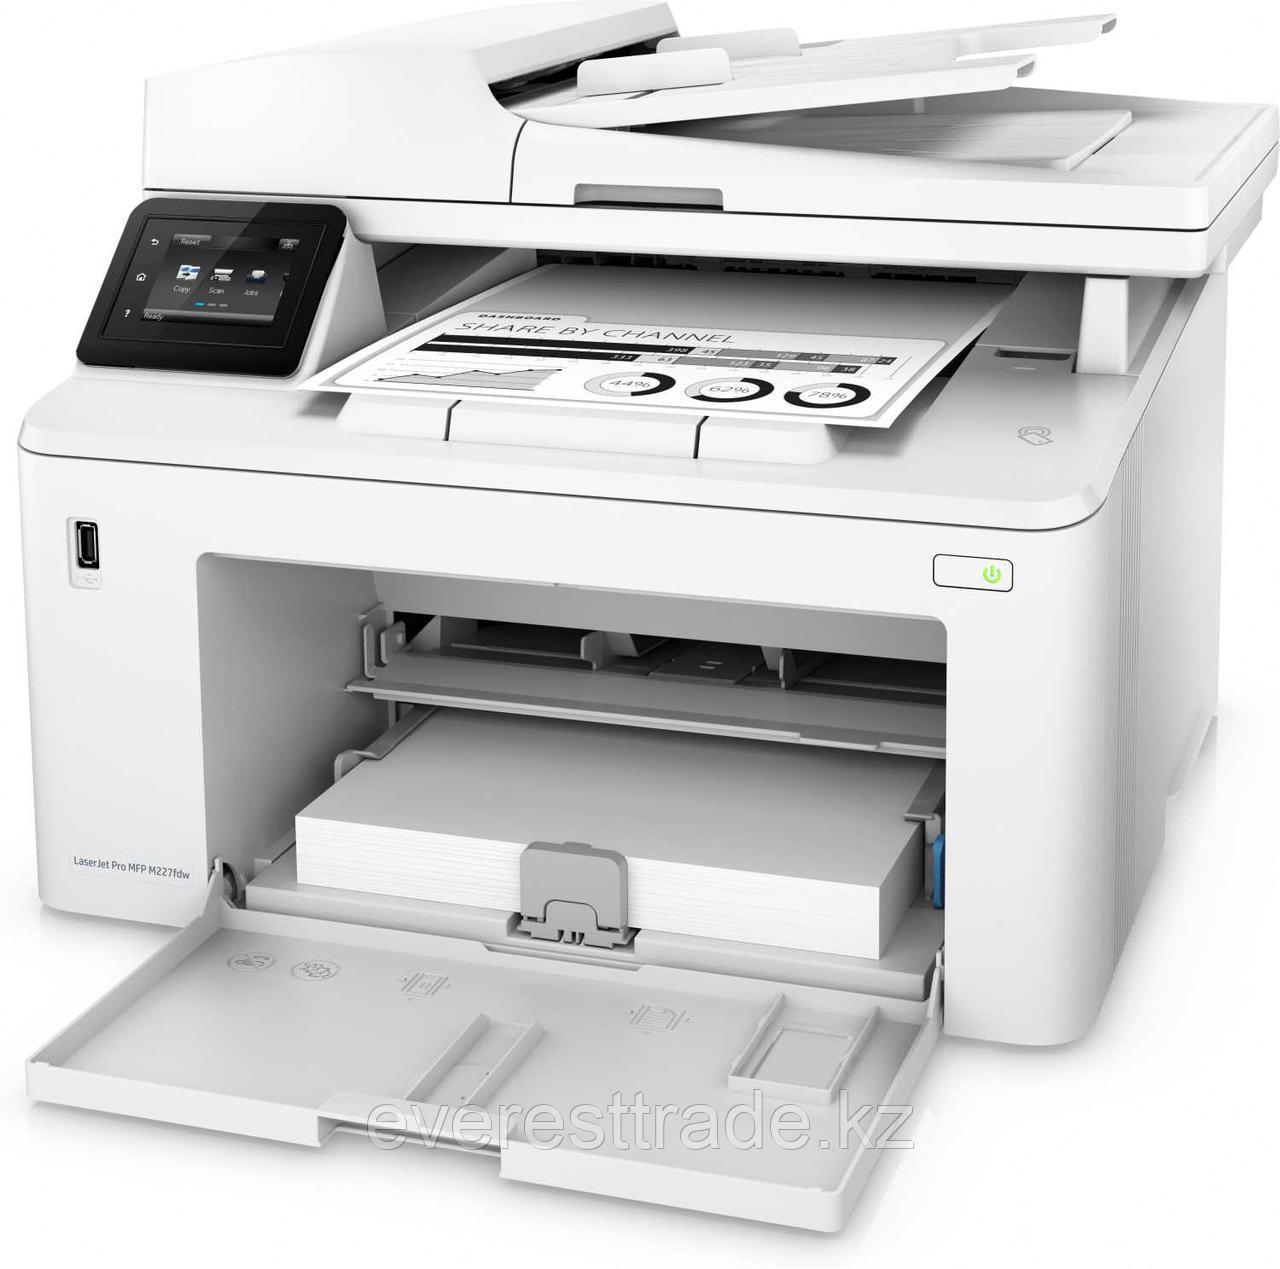 HP МФУ HP LaserJet Pro MFP M227fdw G3Q75A